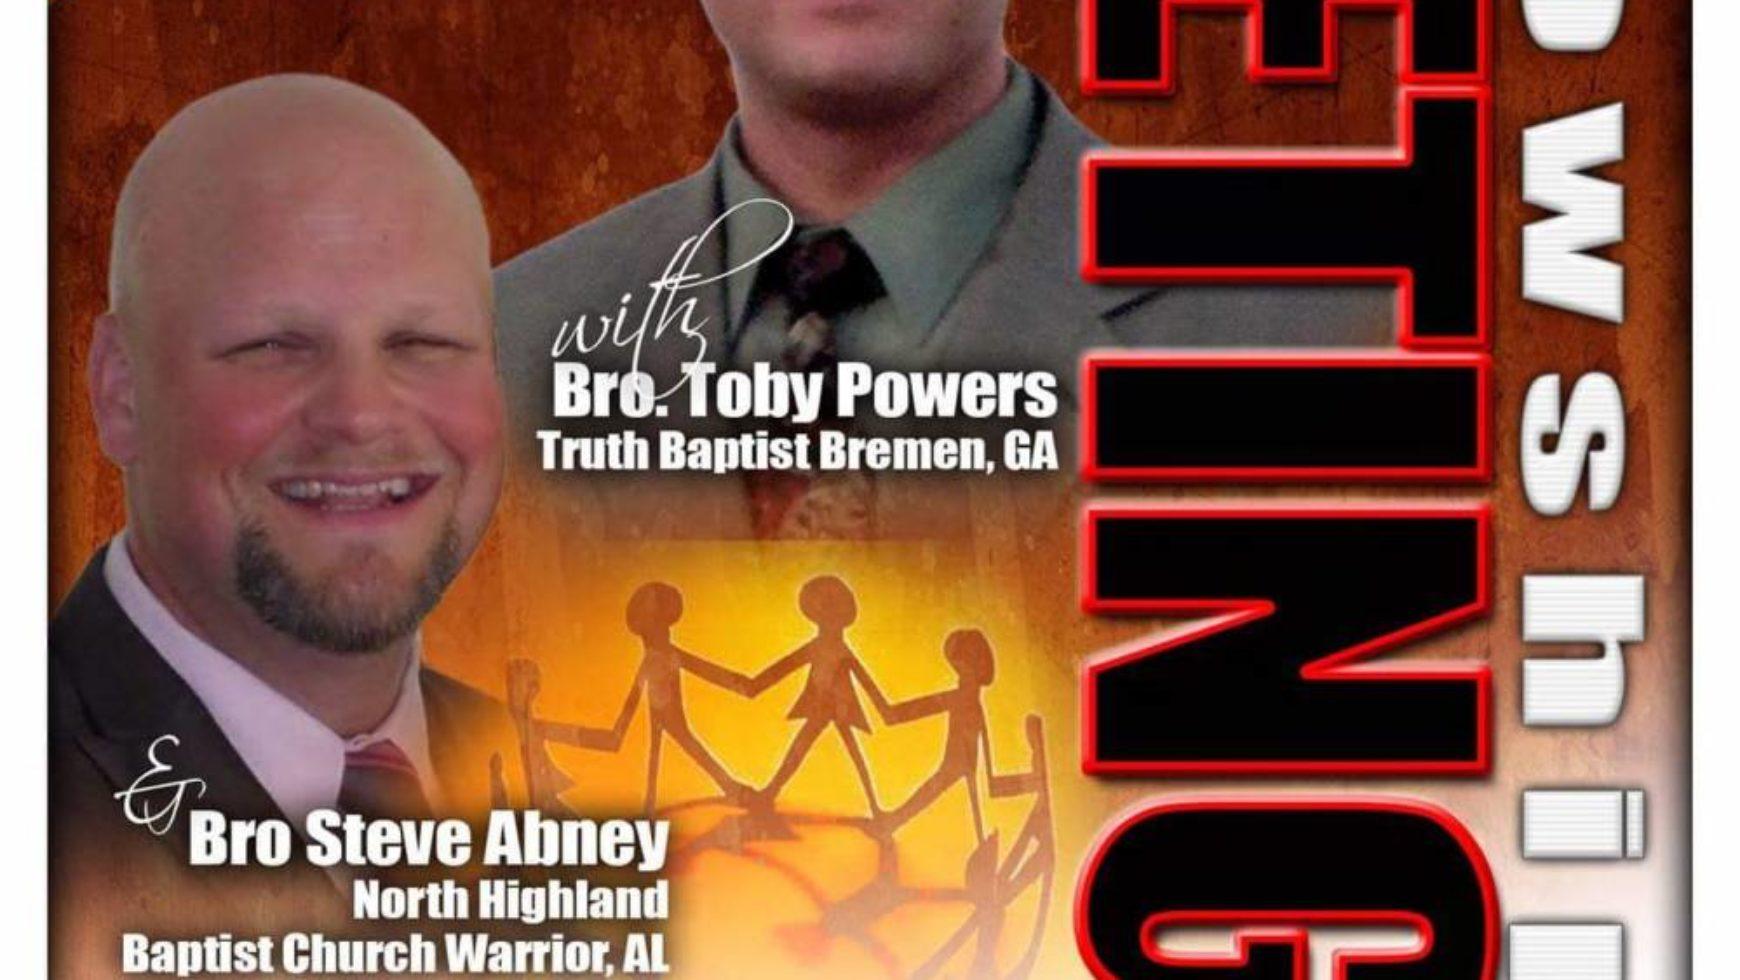 Area Meeting: Fellowship Meeting – New Prospect Baptist Church – Cullman, Al